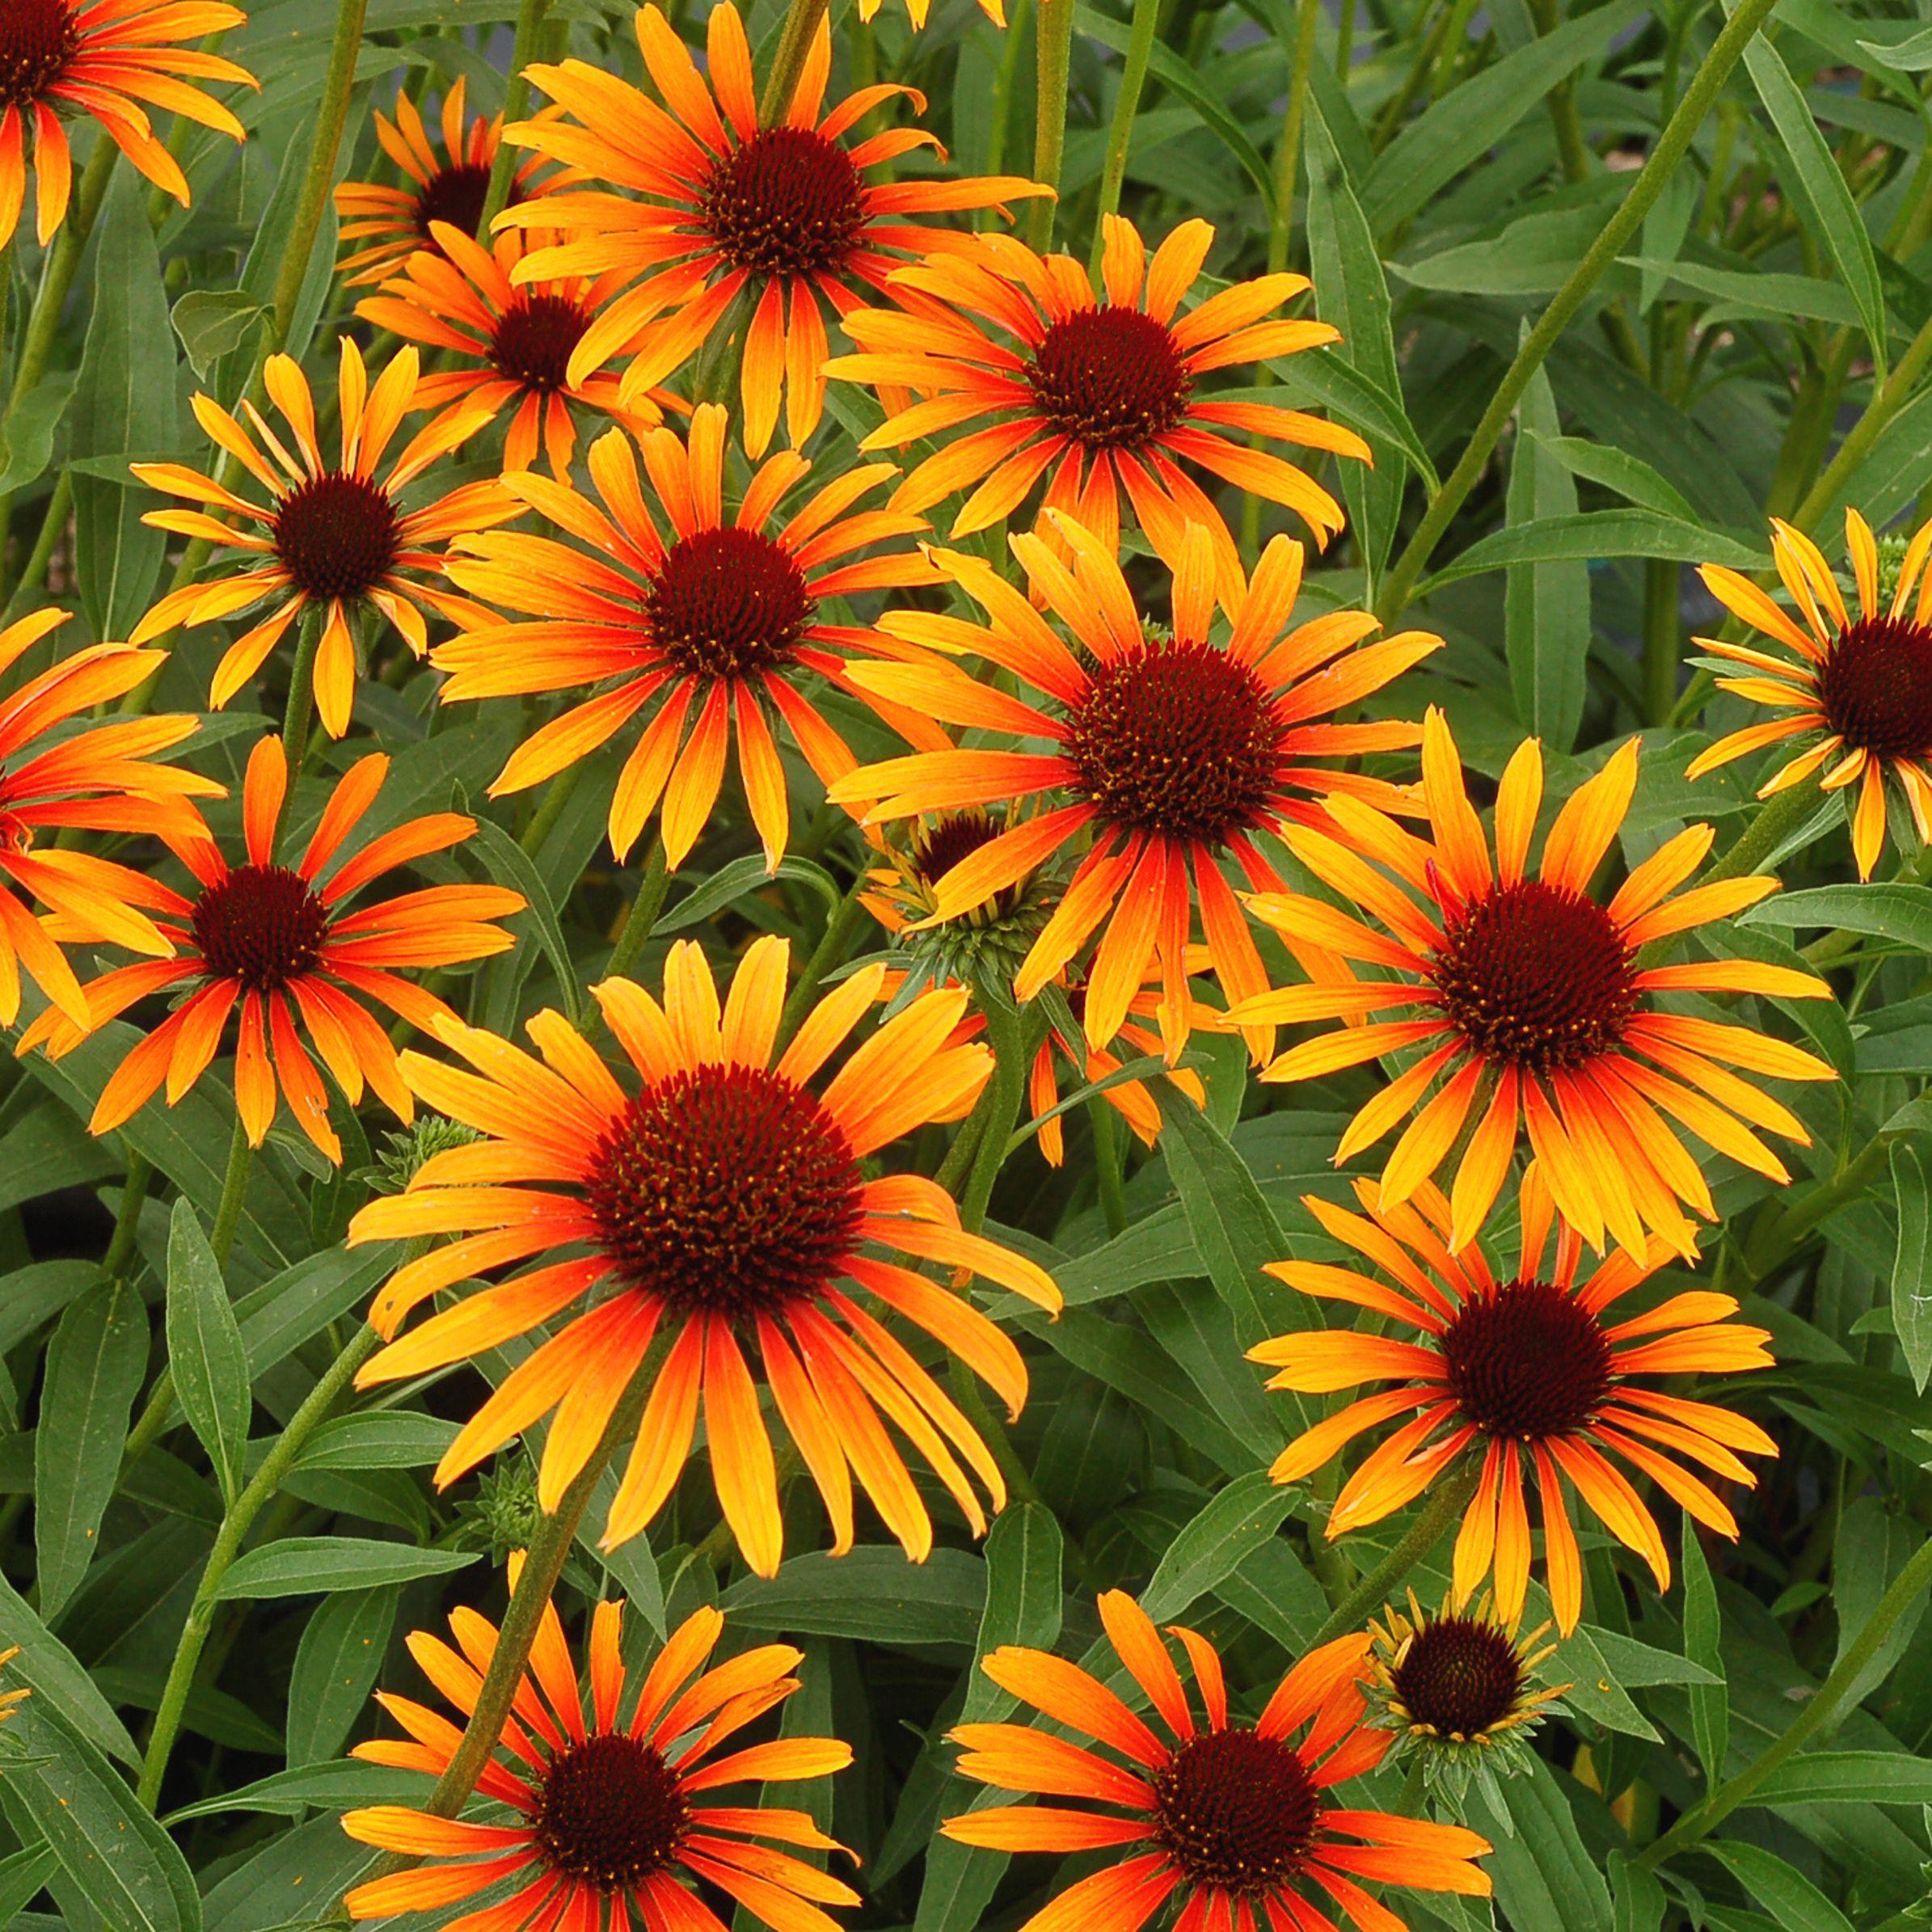 Echinacea Flame Thrower Jpg 2390 2390 Perennials Echinacea Garden Center